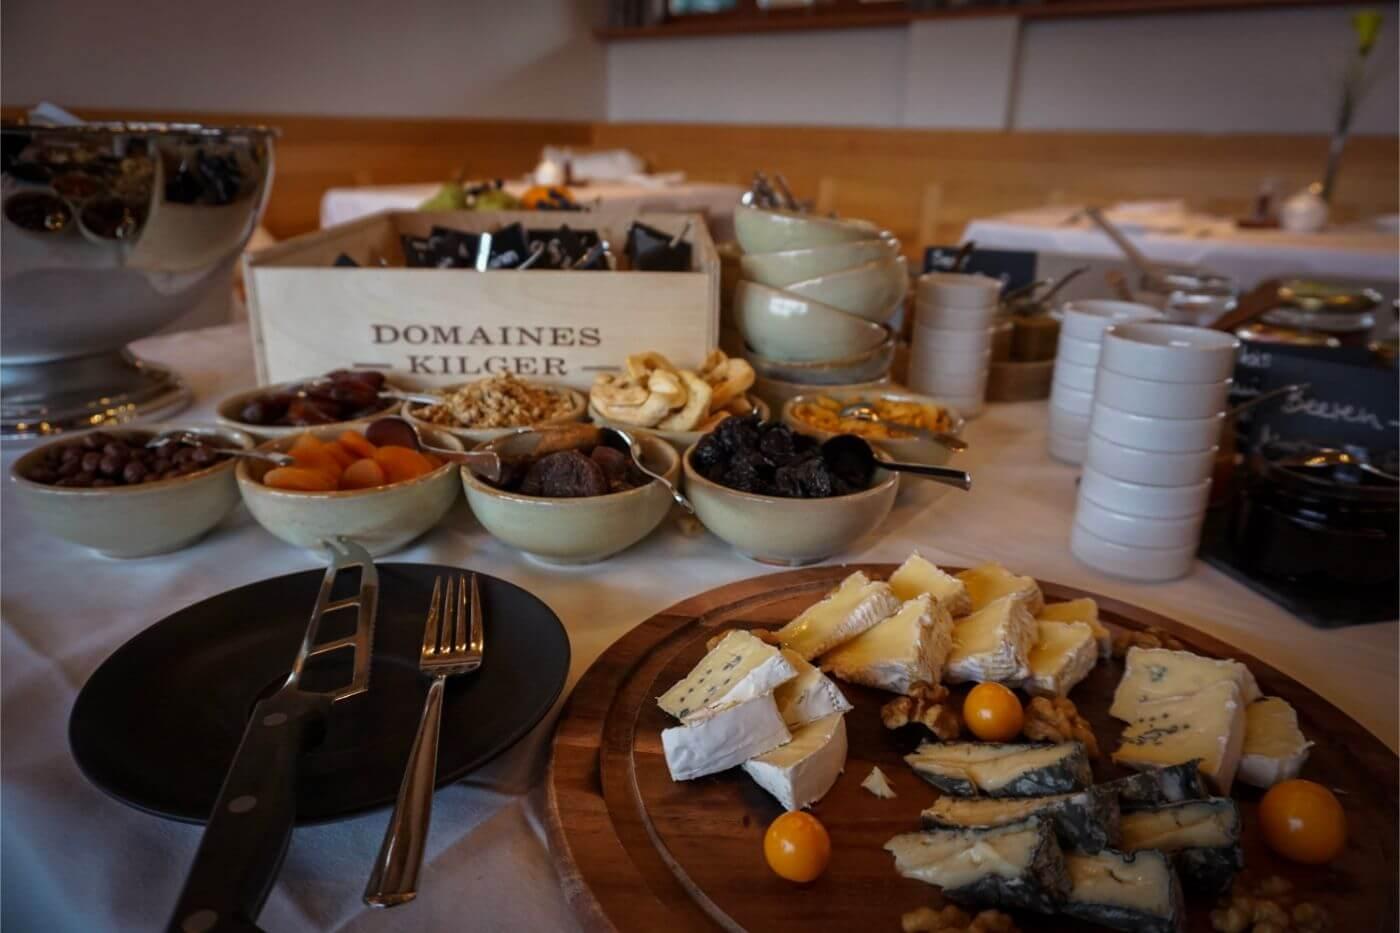 Breakfast Buffet at Jaglhof by Domaines Kilger - South Styria Hotel, Austria